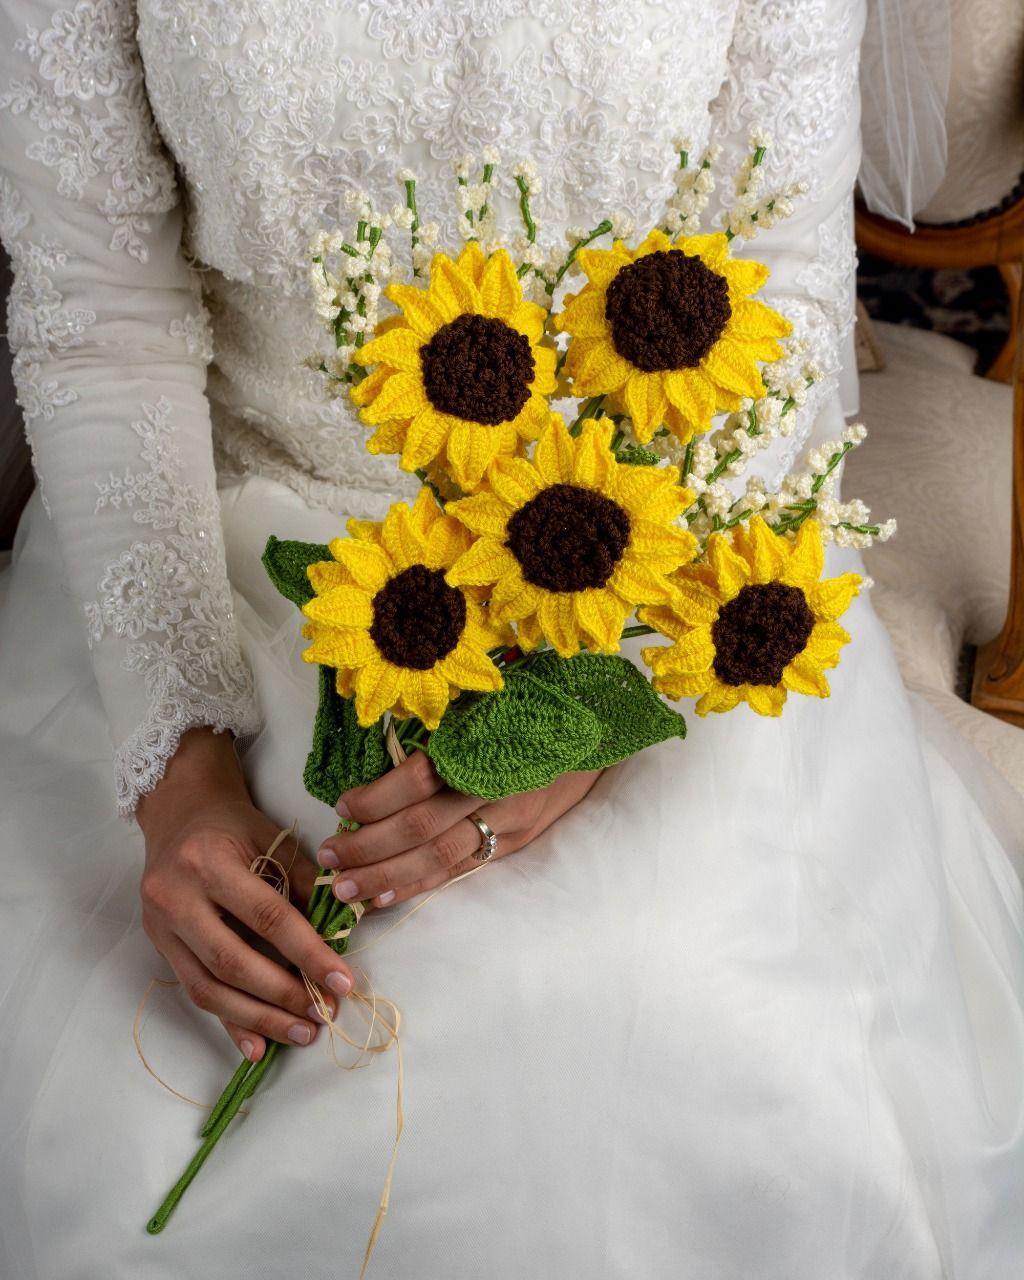 Sunflowers & Gypsophilas